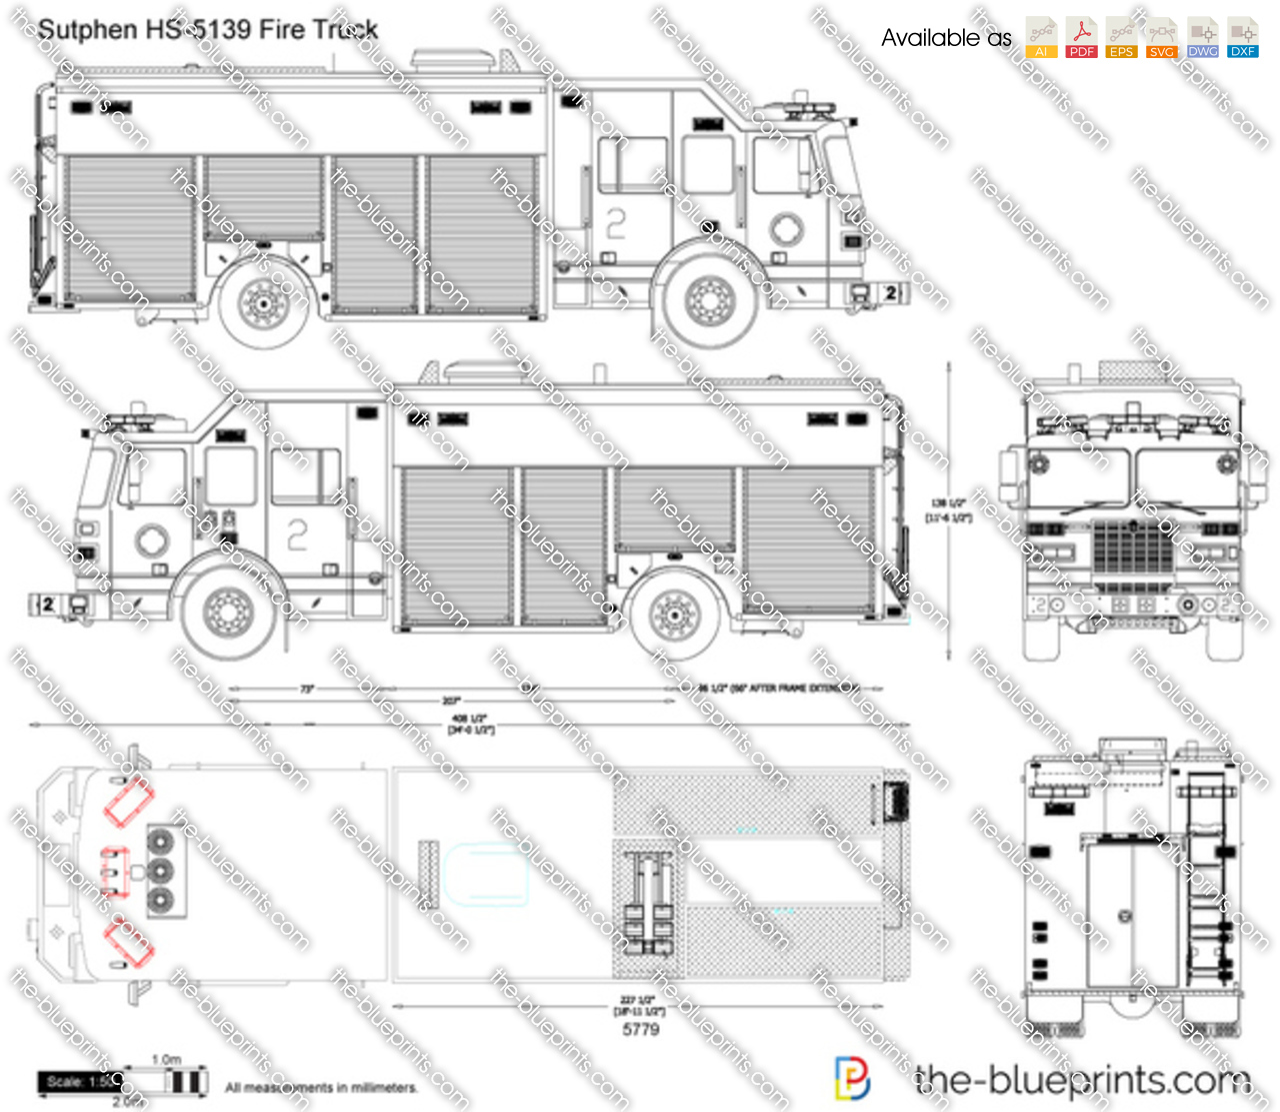 Sutphen Hs 5139 Fire Truck Vector Drawing Diagram Of Pierce Engine